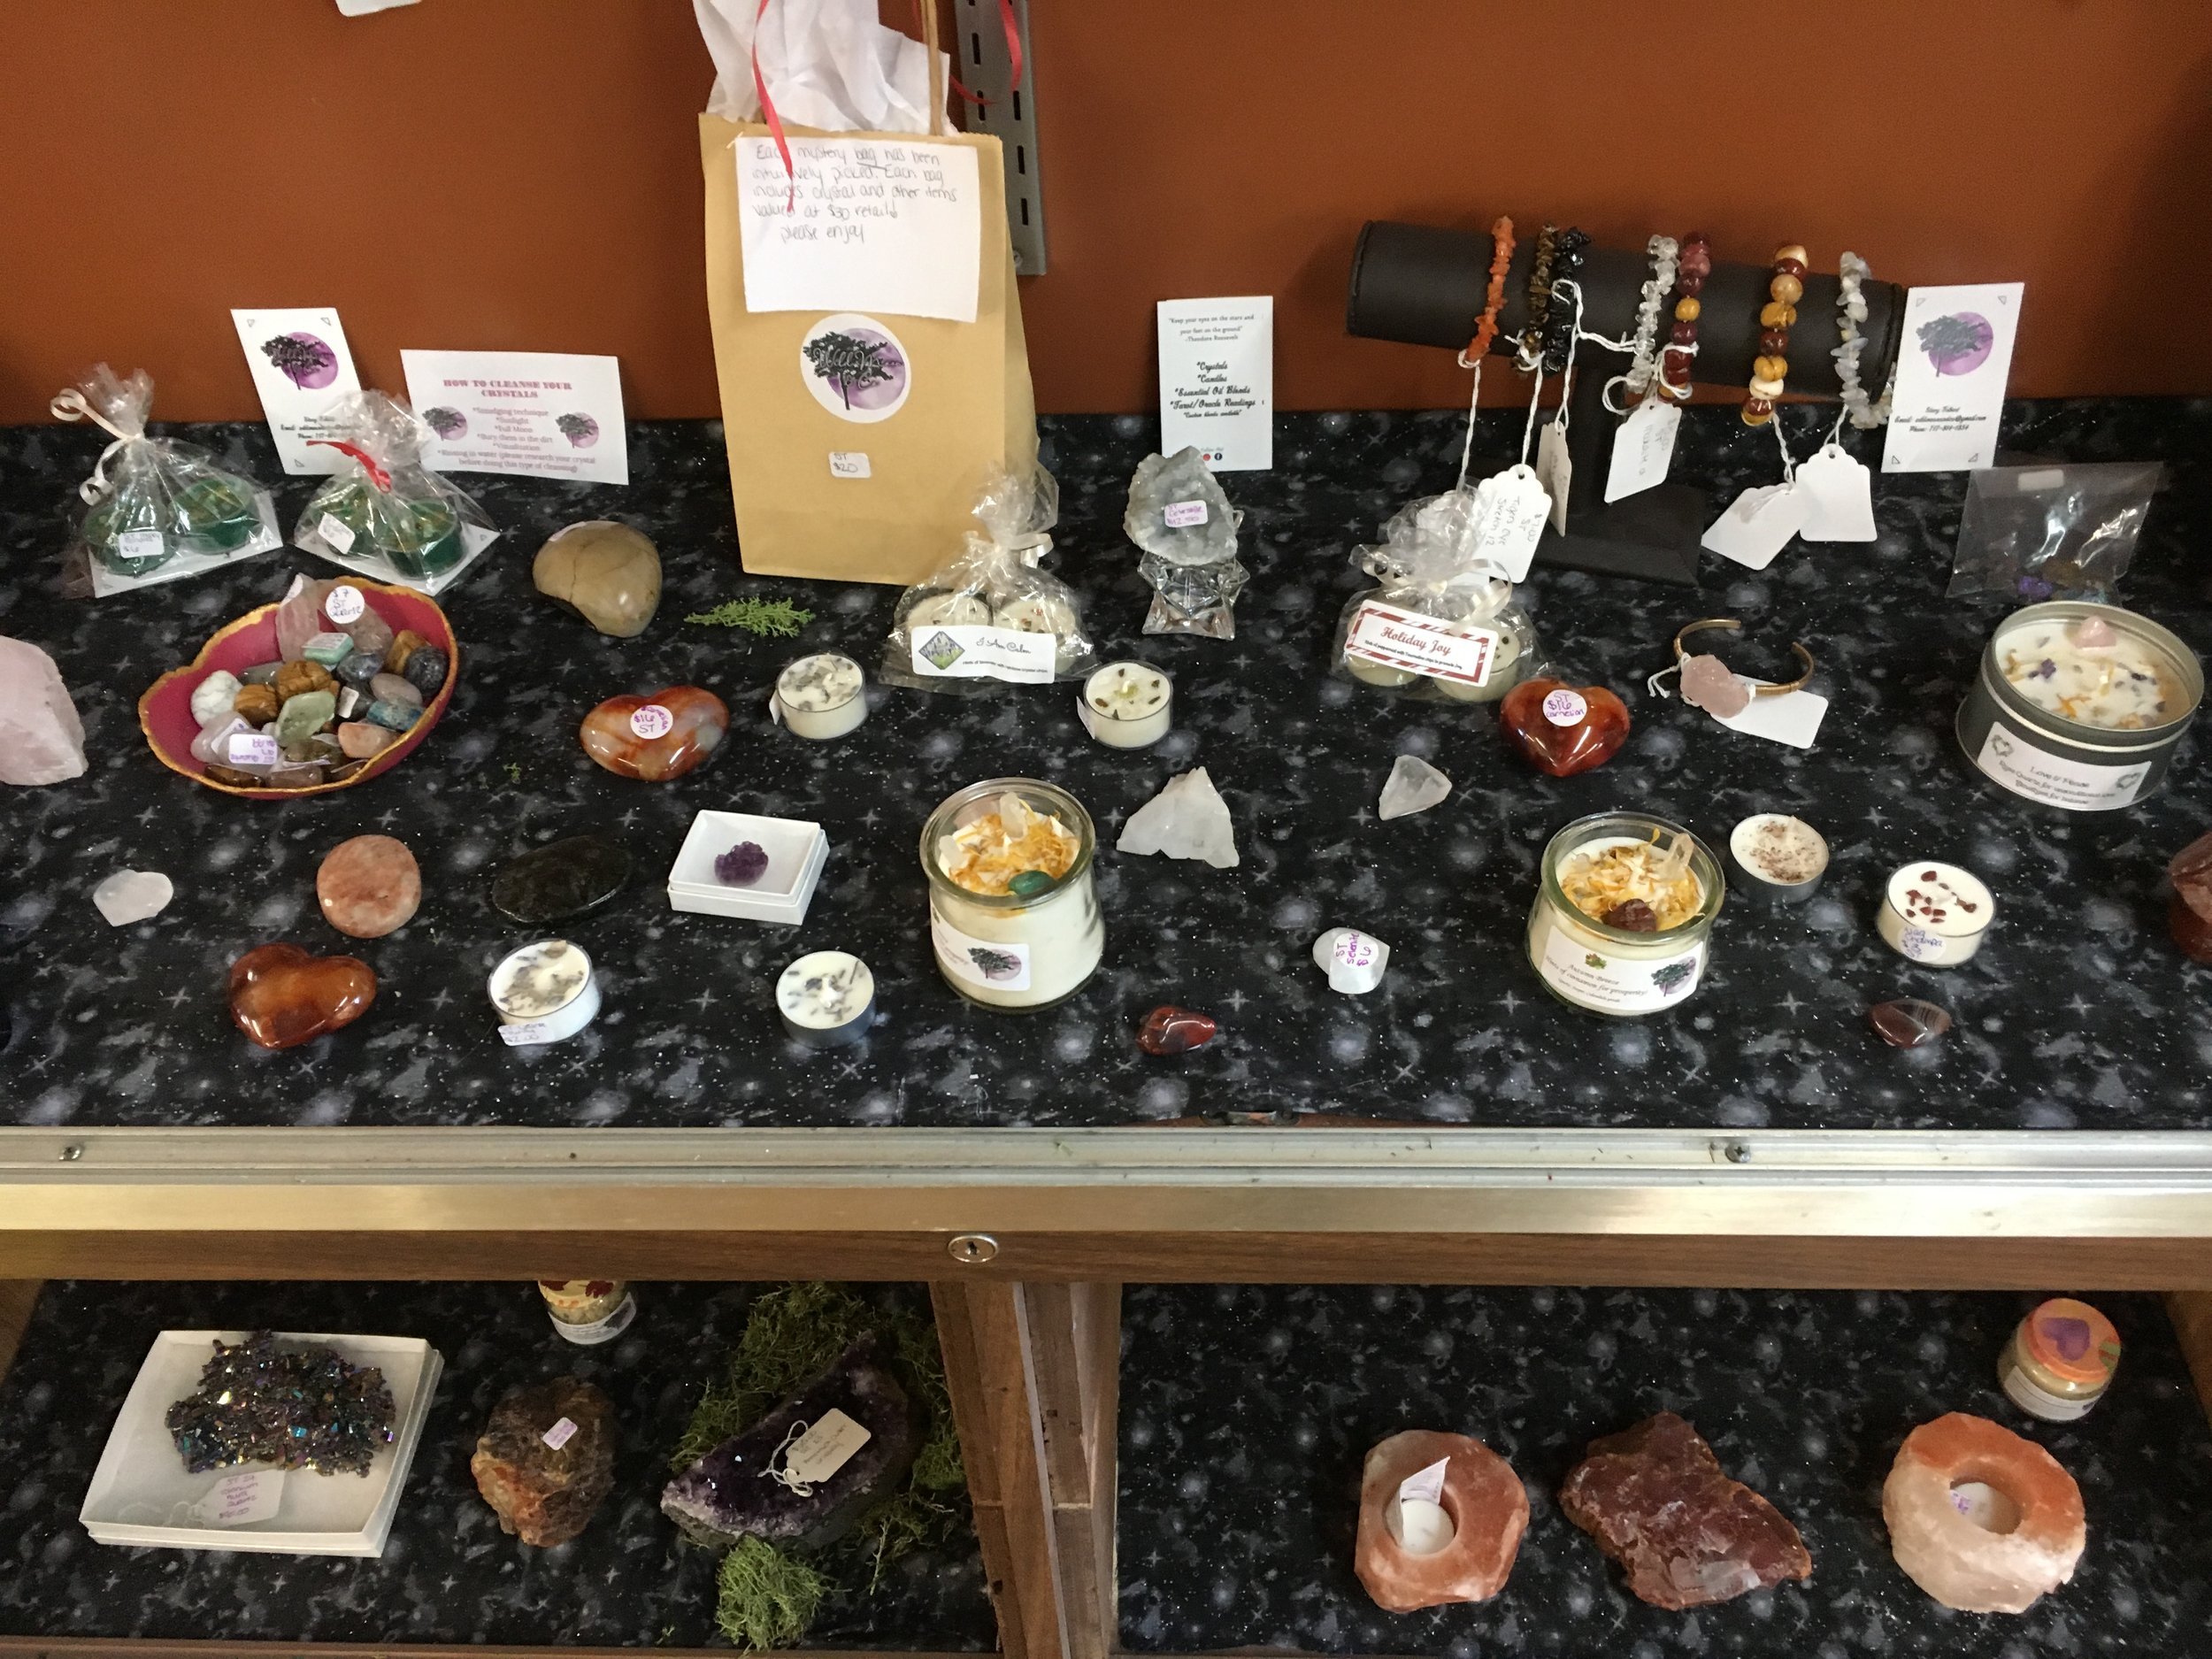 Wild Moon & Co - Crystals, jewelry, scrubs, and good vibes!Facebook.com/wildmoonandcoInstagram.com/wildmoon.and.coEmail: wildmoonandco@gmail.com